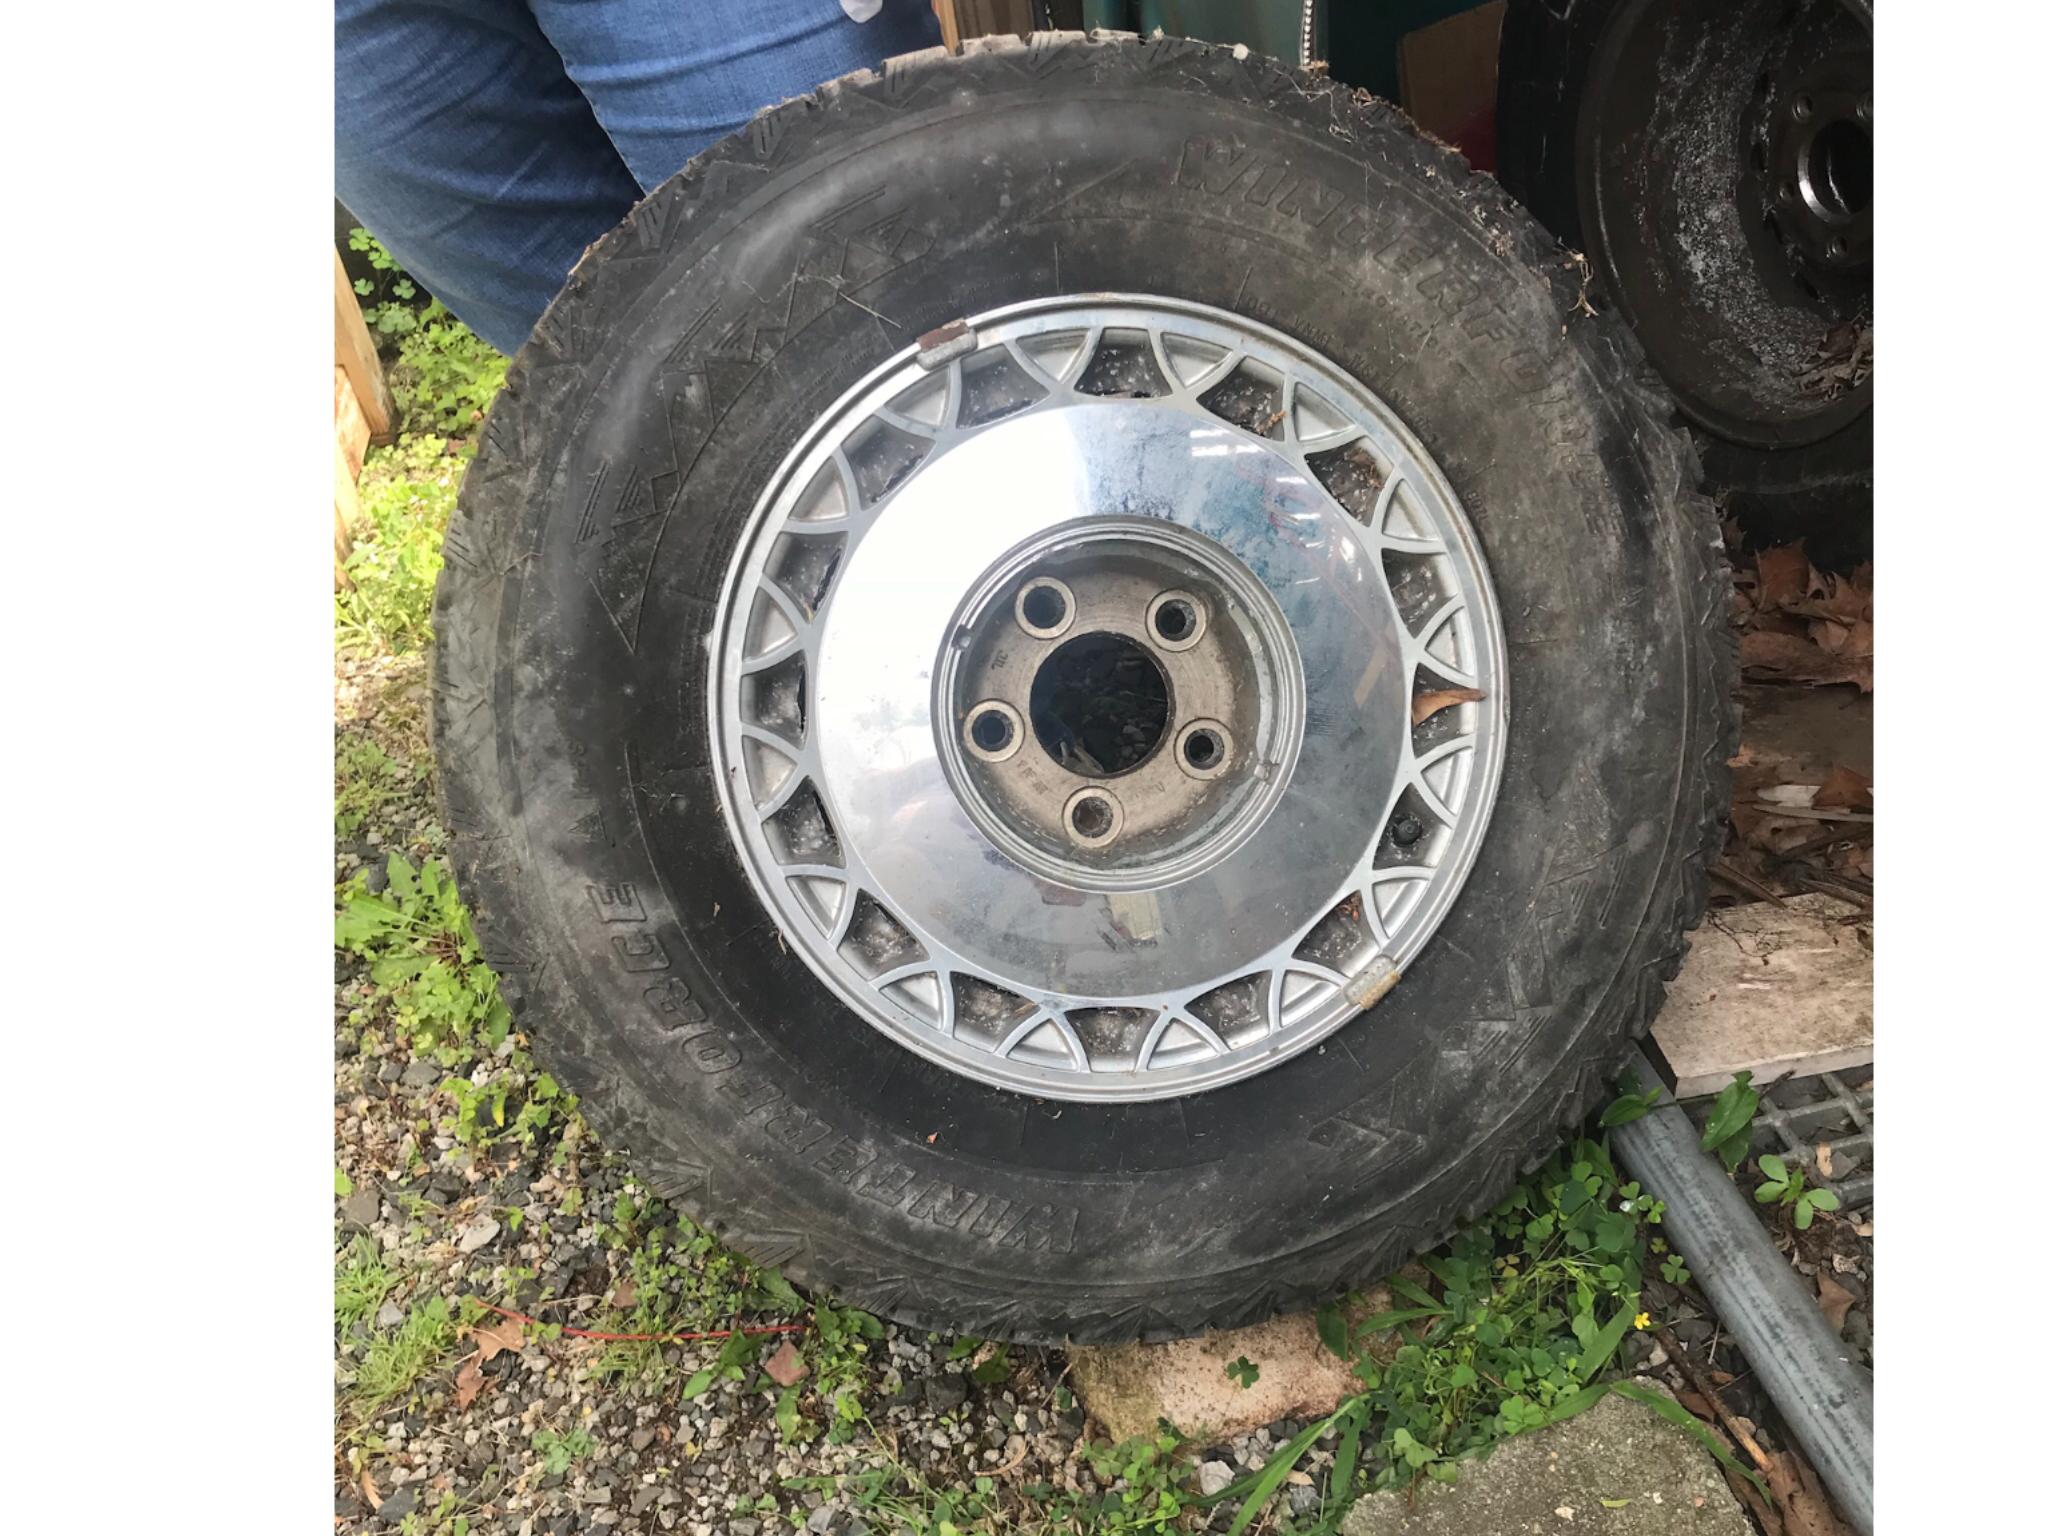 93-96 Cadillac Wheels